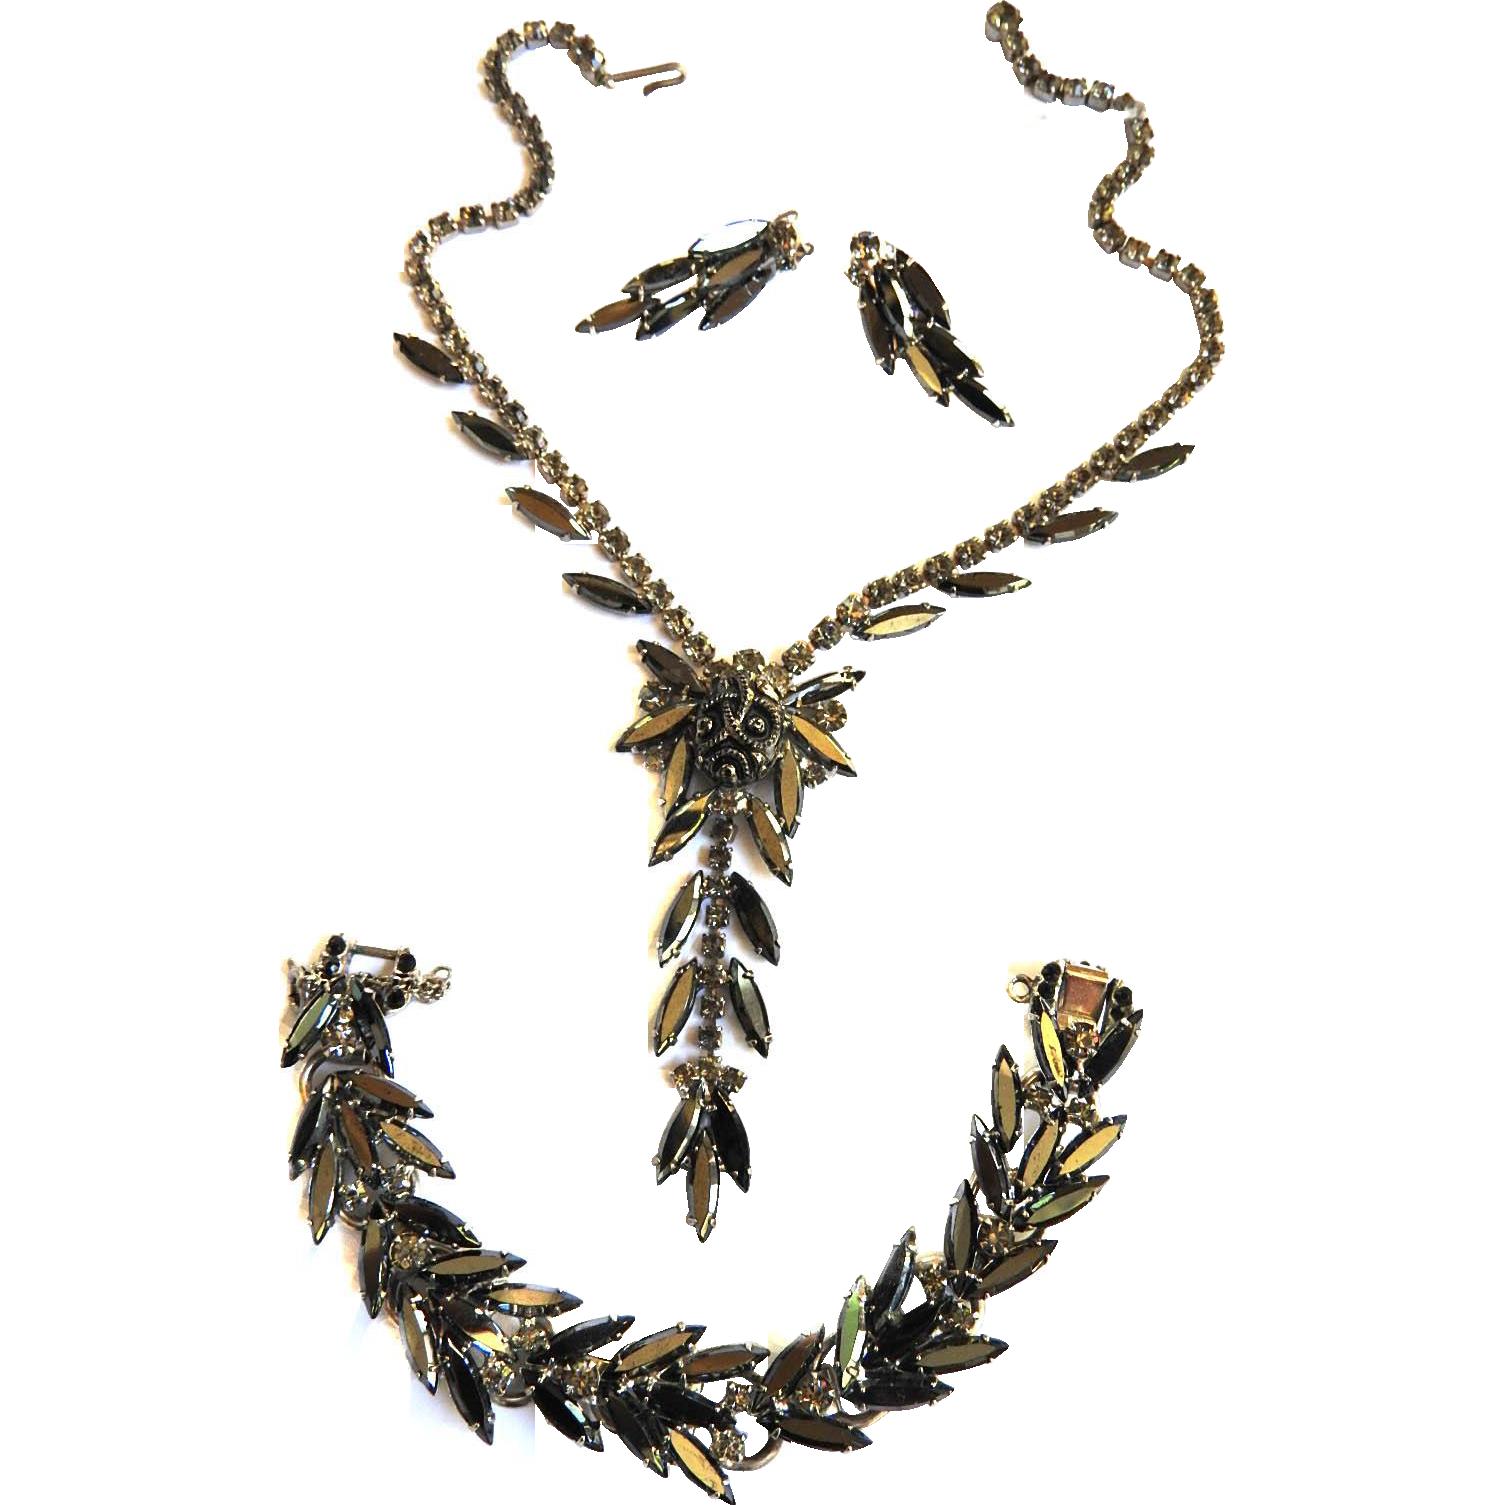 Vintage Juliana Hematite Waterfall Necklace Bracelet and Earrings